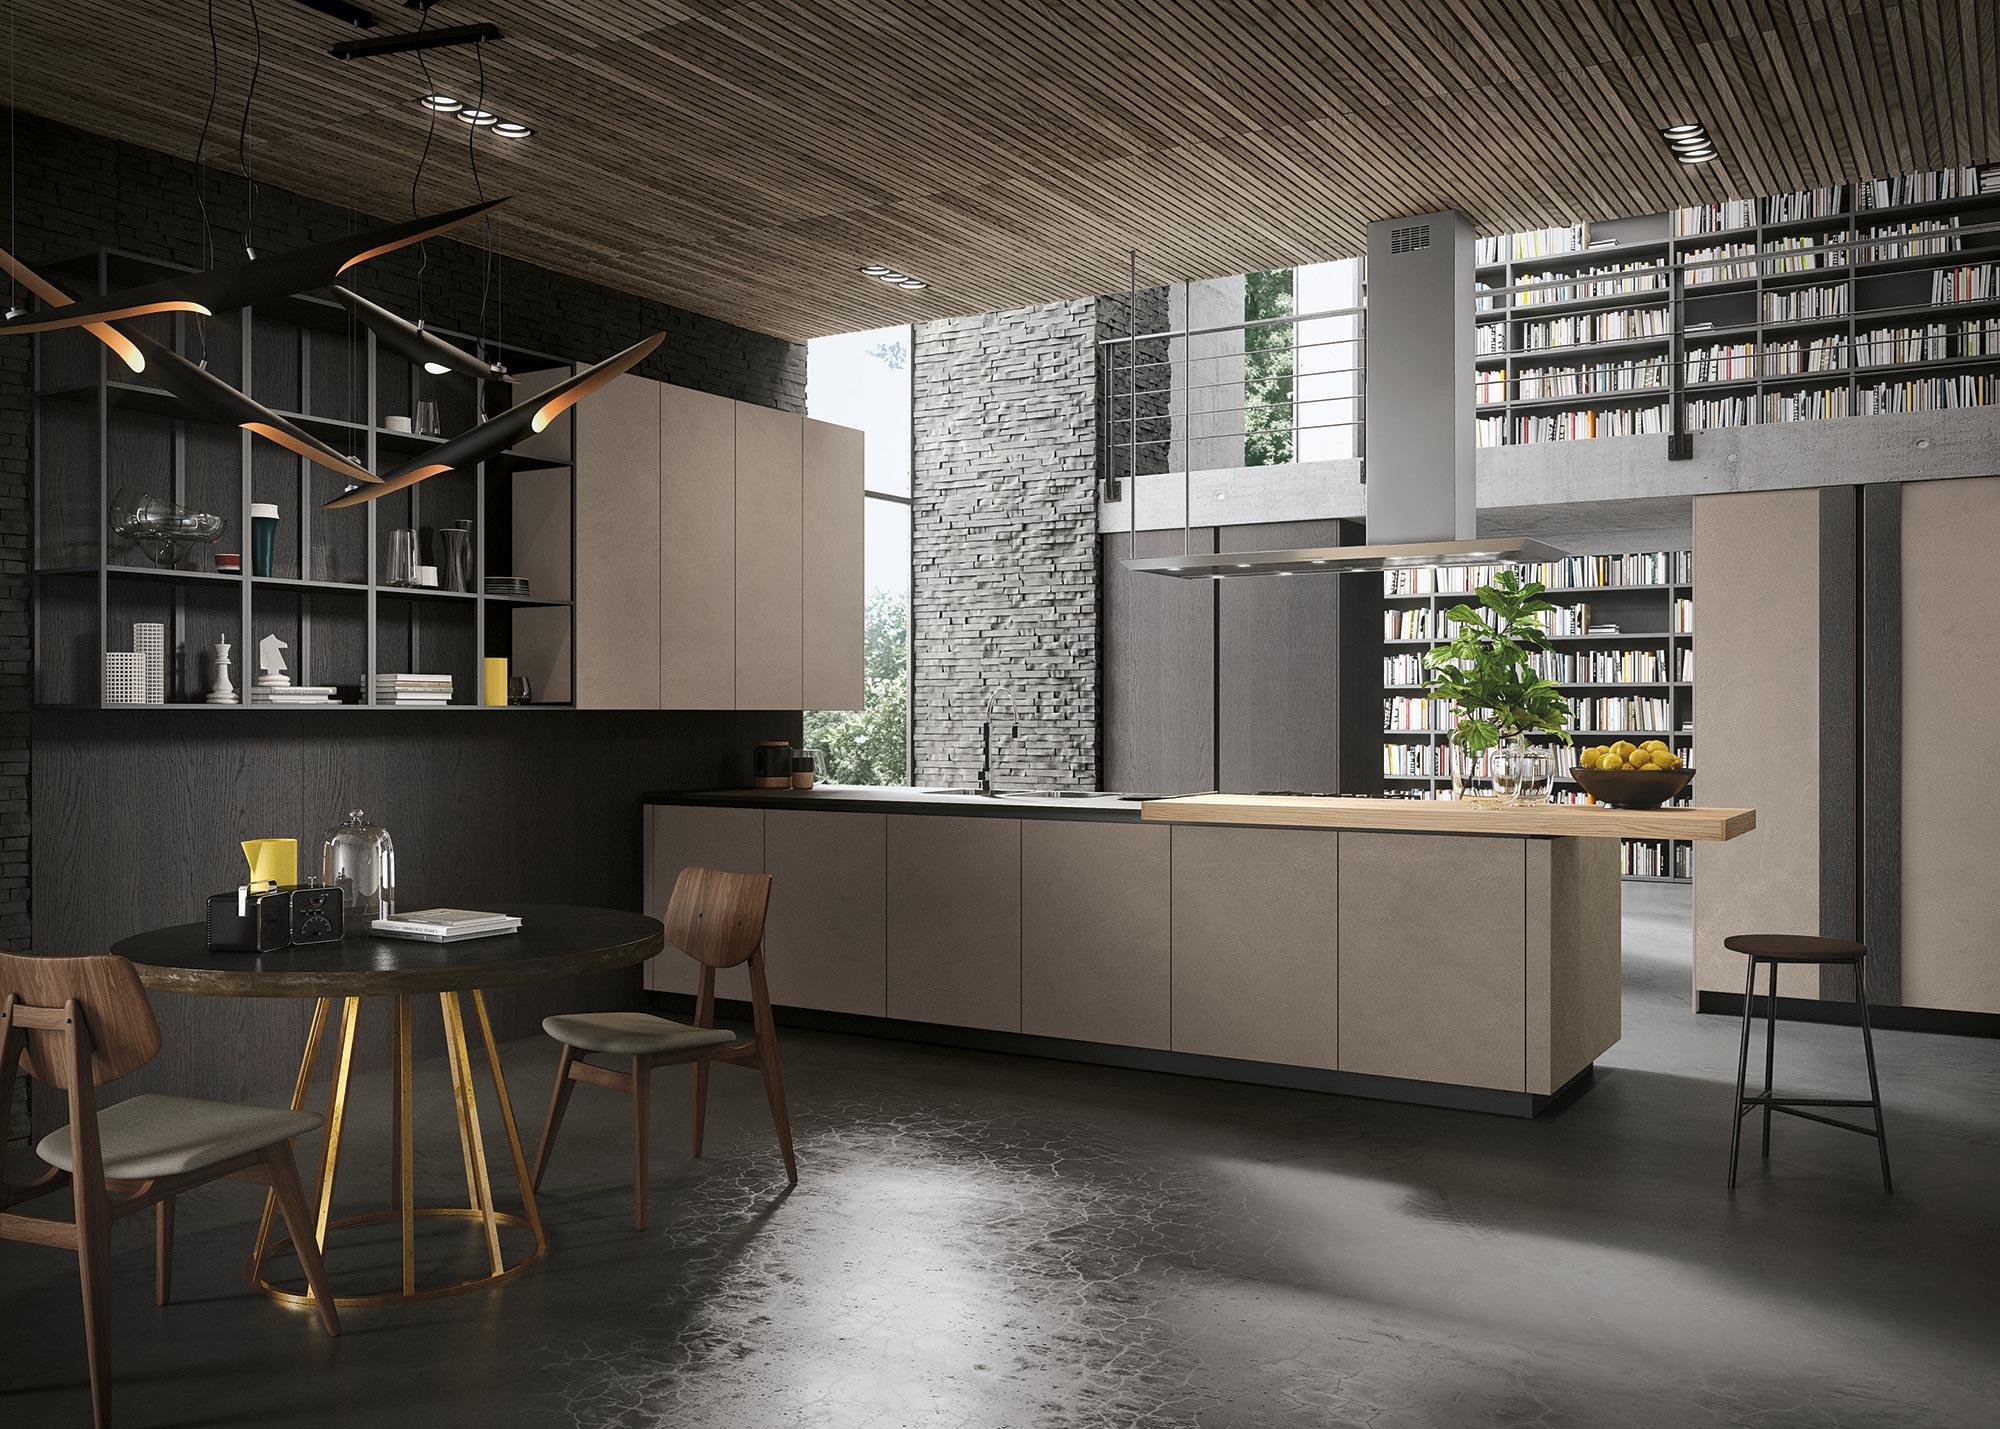 cucine-componibili-moderne-look-snaidero-4